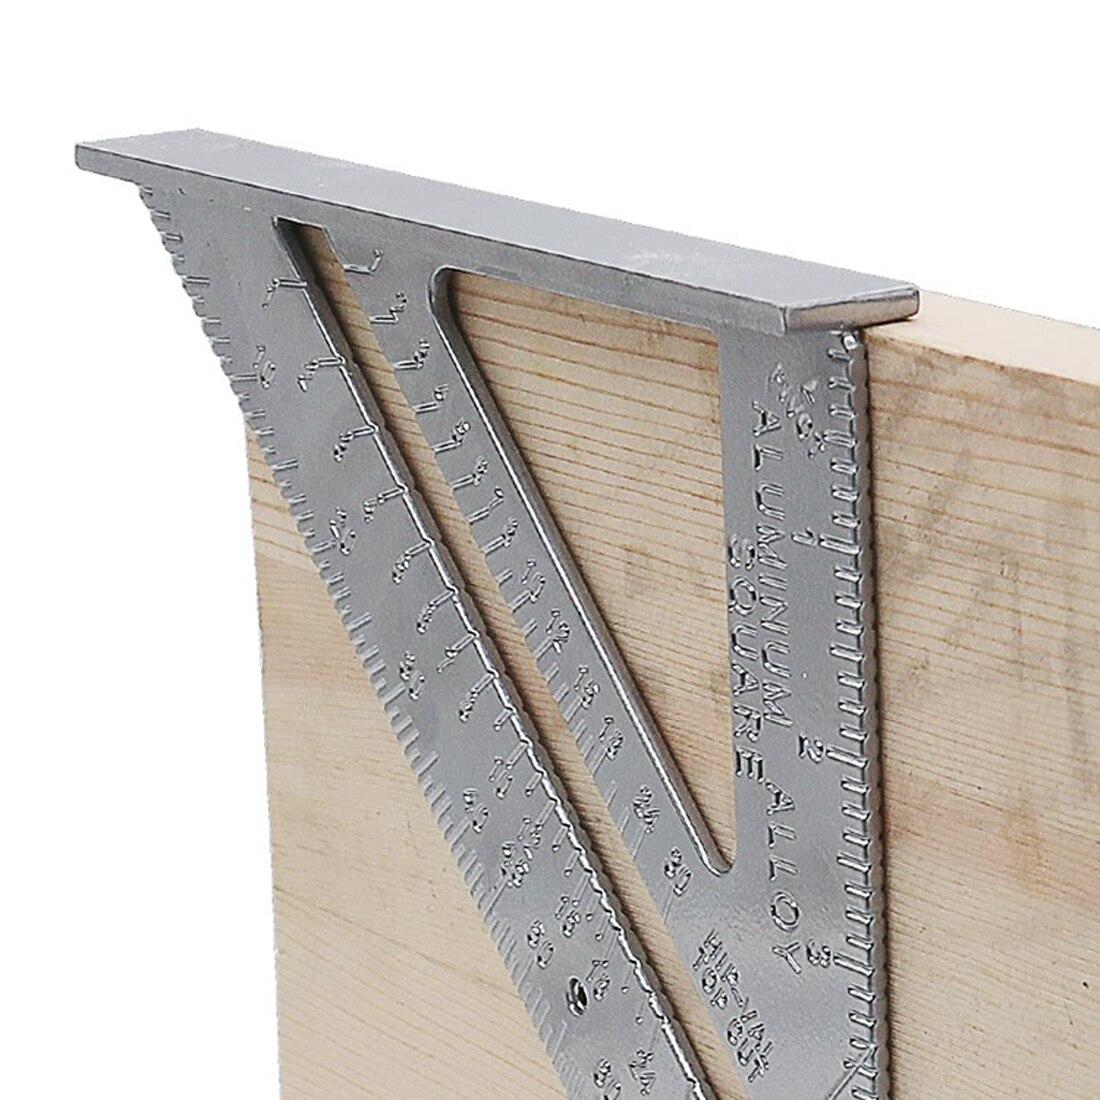 1Pc Triangle Square Ruler Aluminum Alloy Speed Square Protractor Miter Framing Line Scriber Measurement Meter Carpenter Ruler